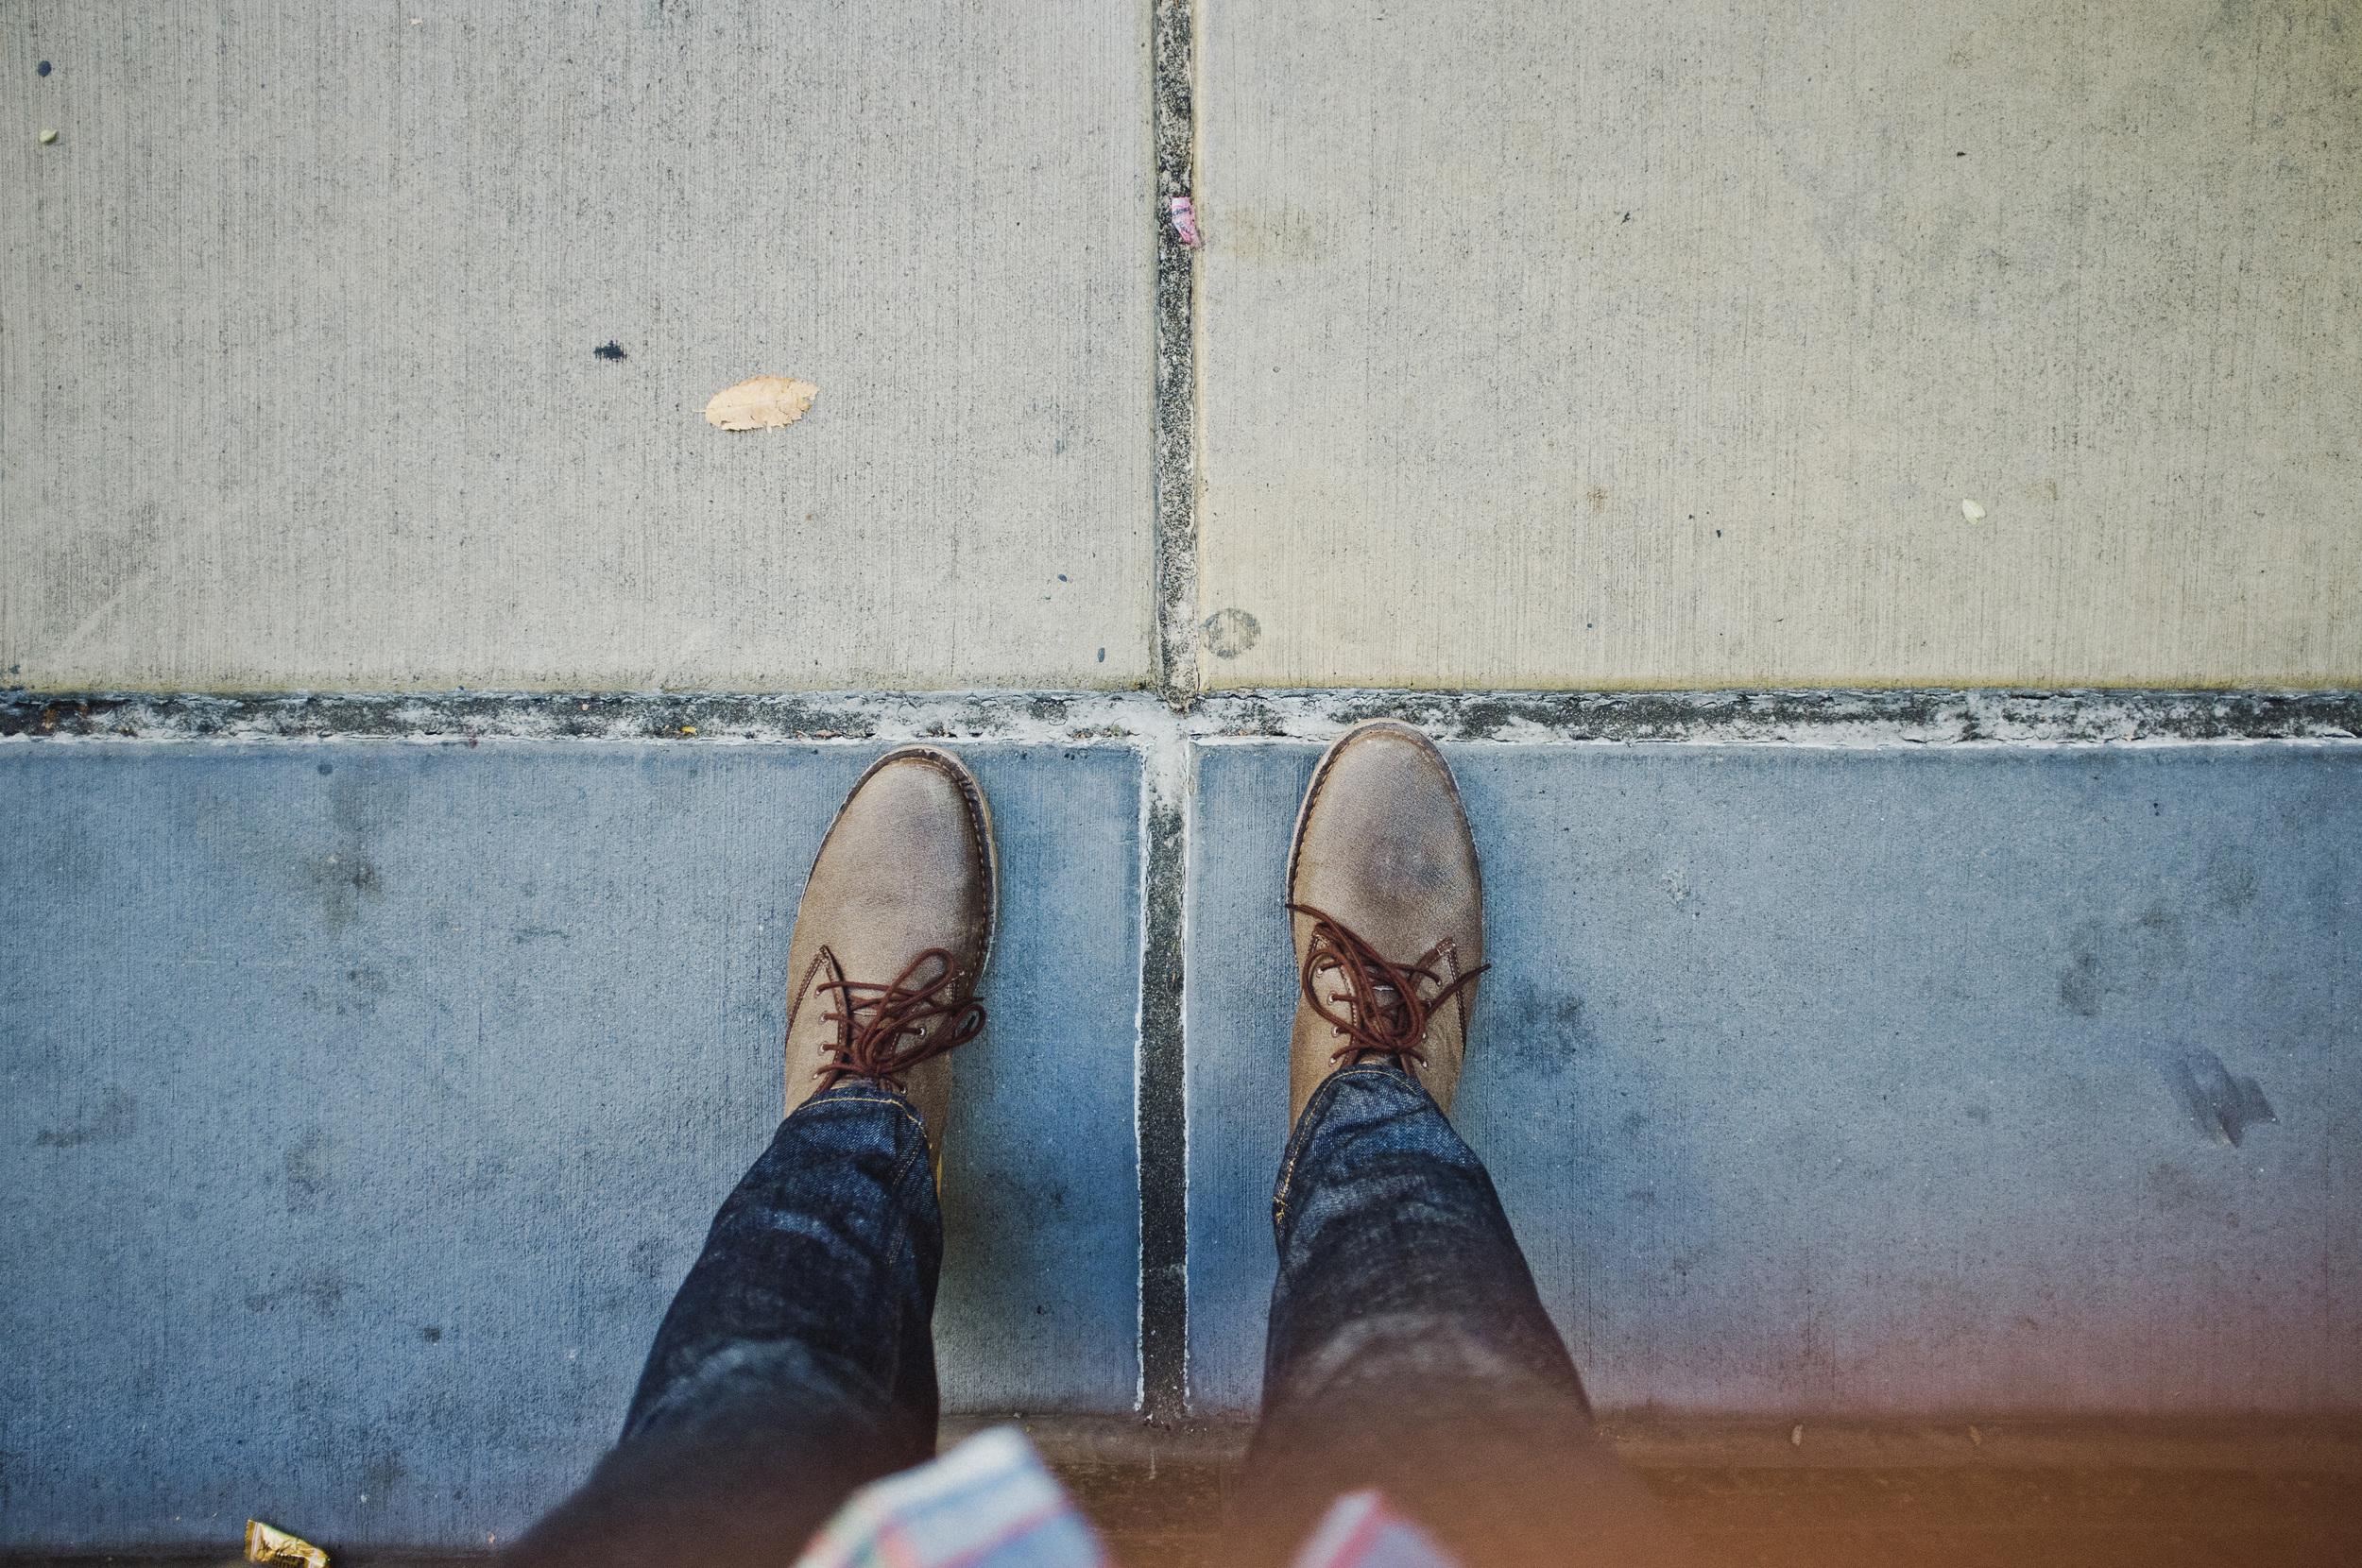 Post byMike Peterson - Executive Deaconat Gospel Life Church